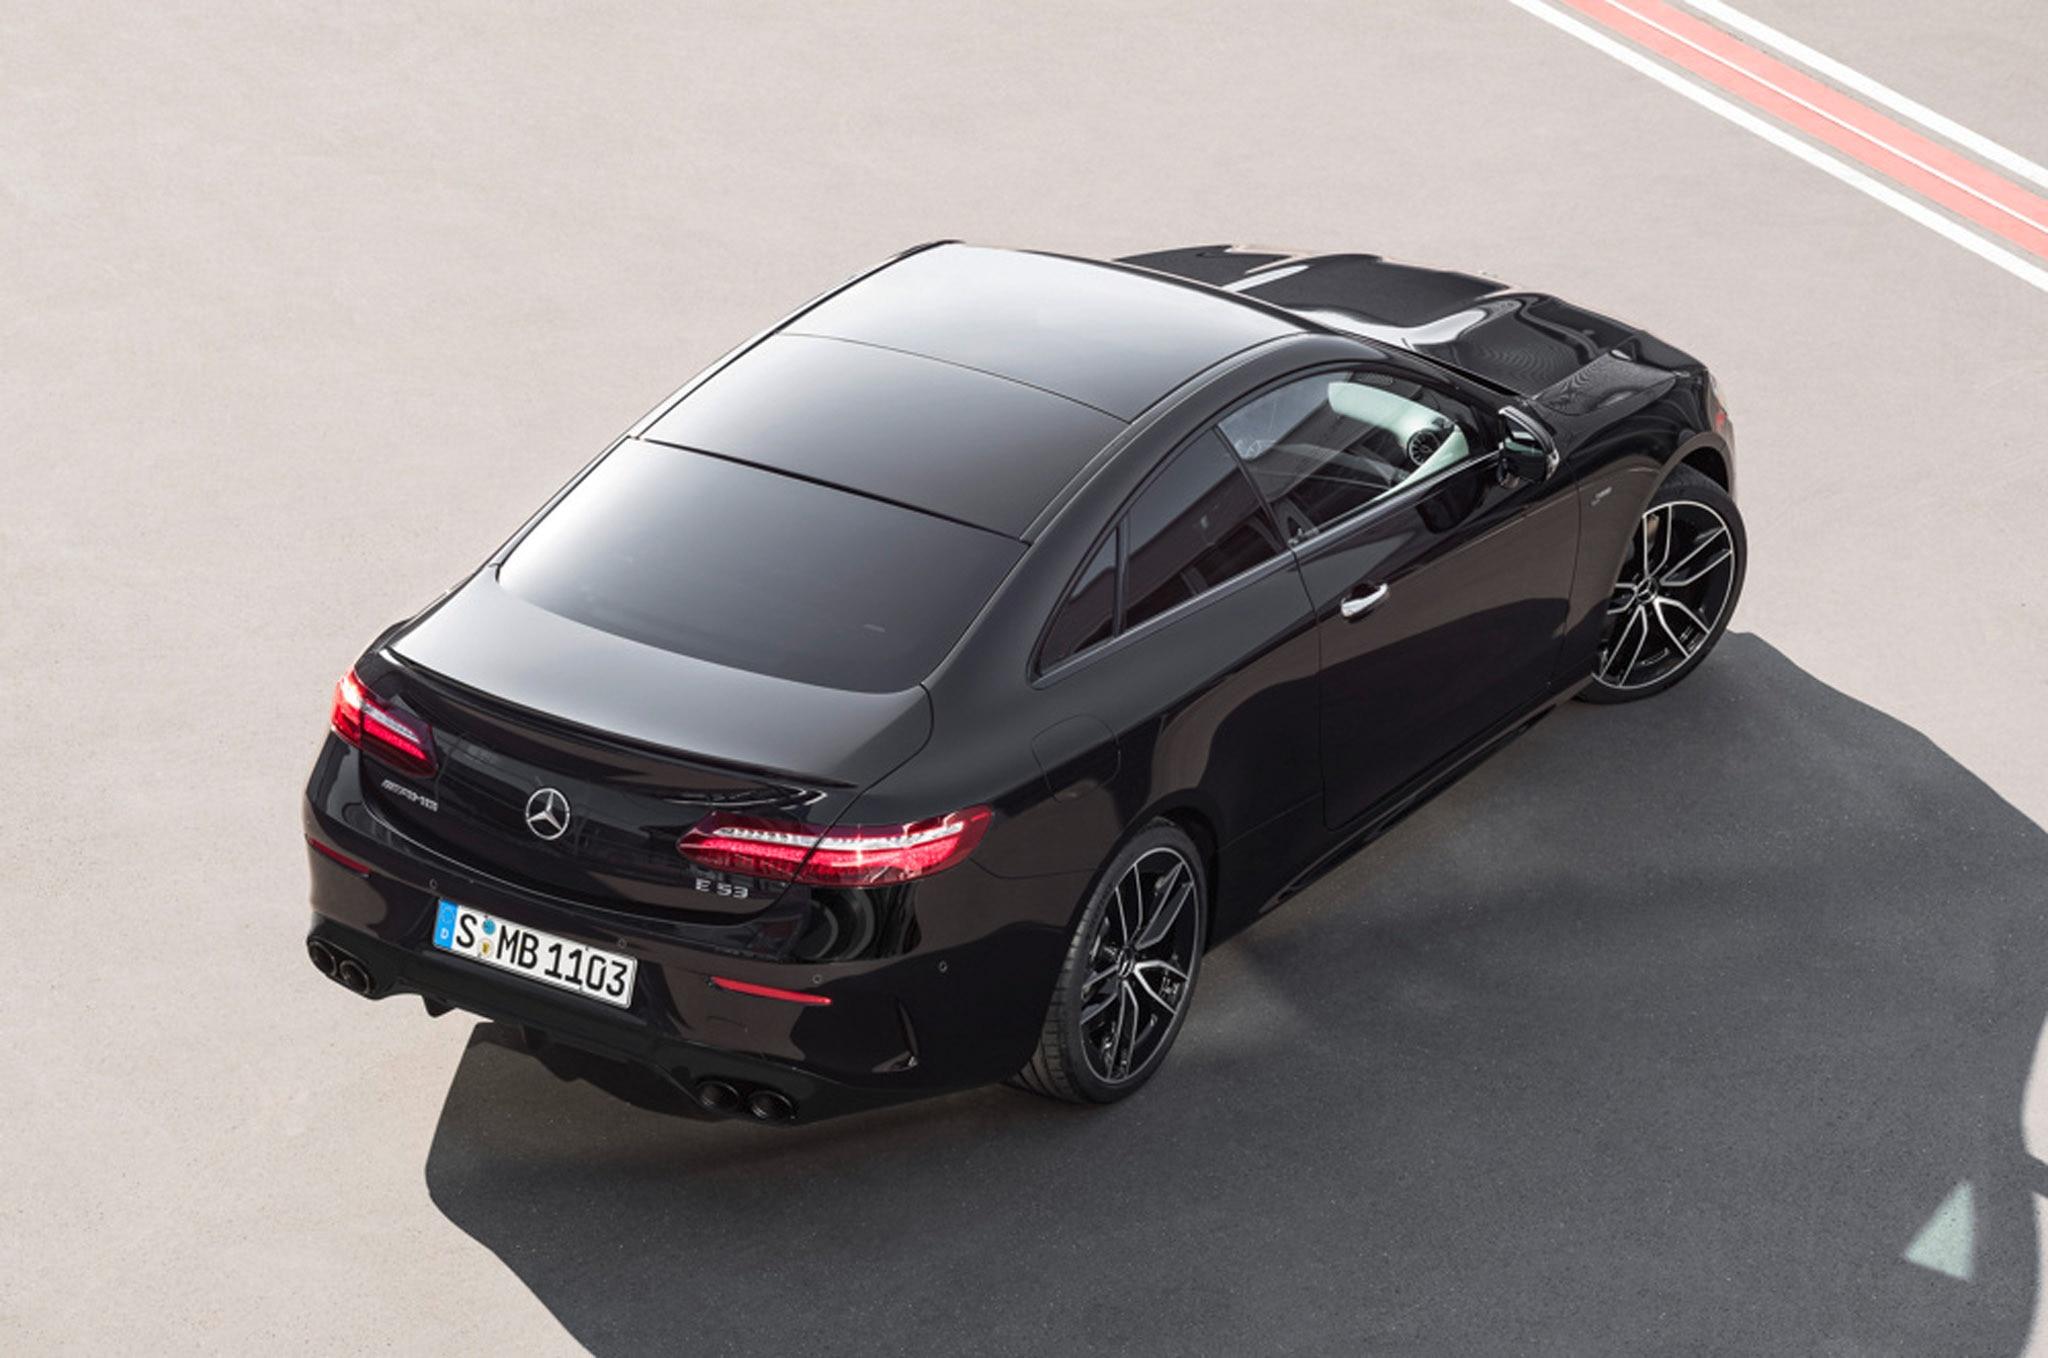 https://st.automobilemag.com/uploads/sites/11/2018/01/2019-Mercedes-AMG-E-53-Coupe_13.jpg